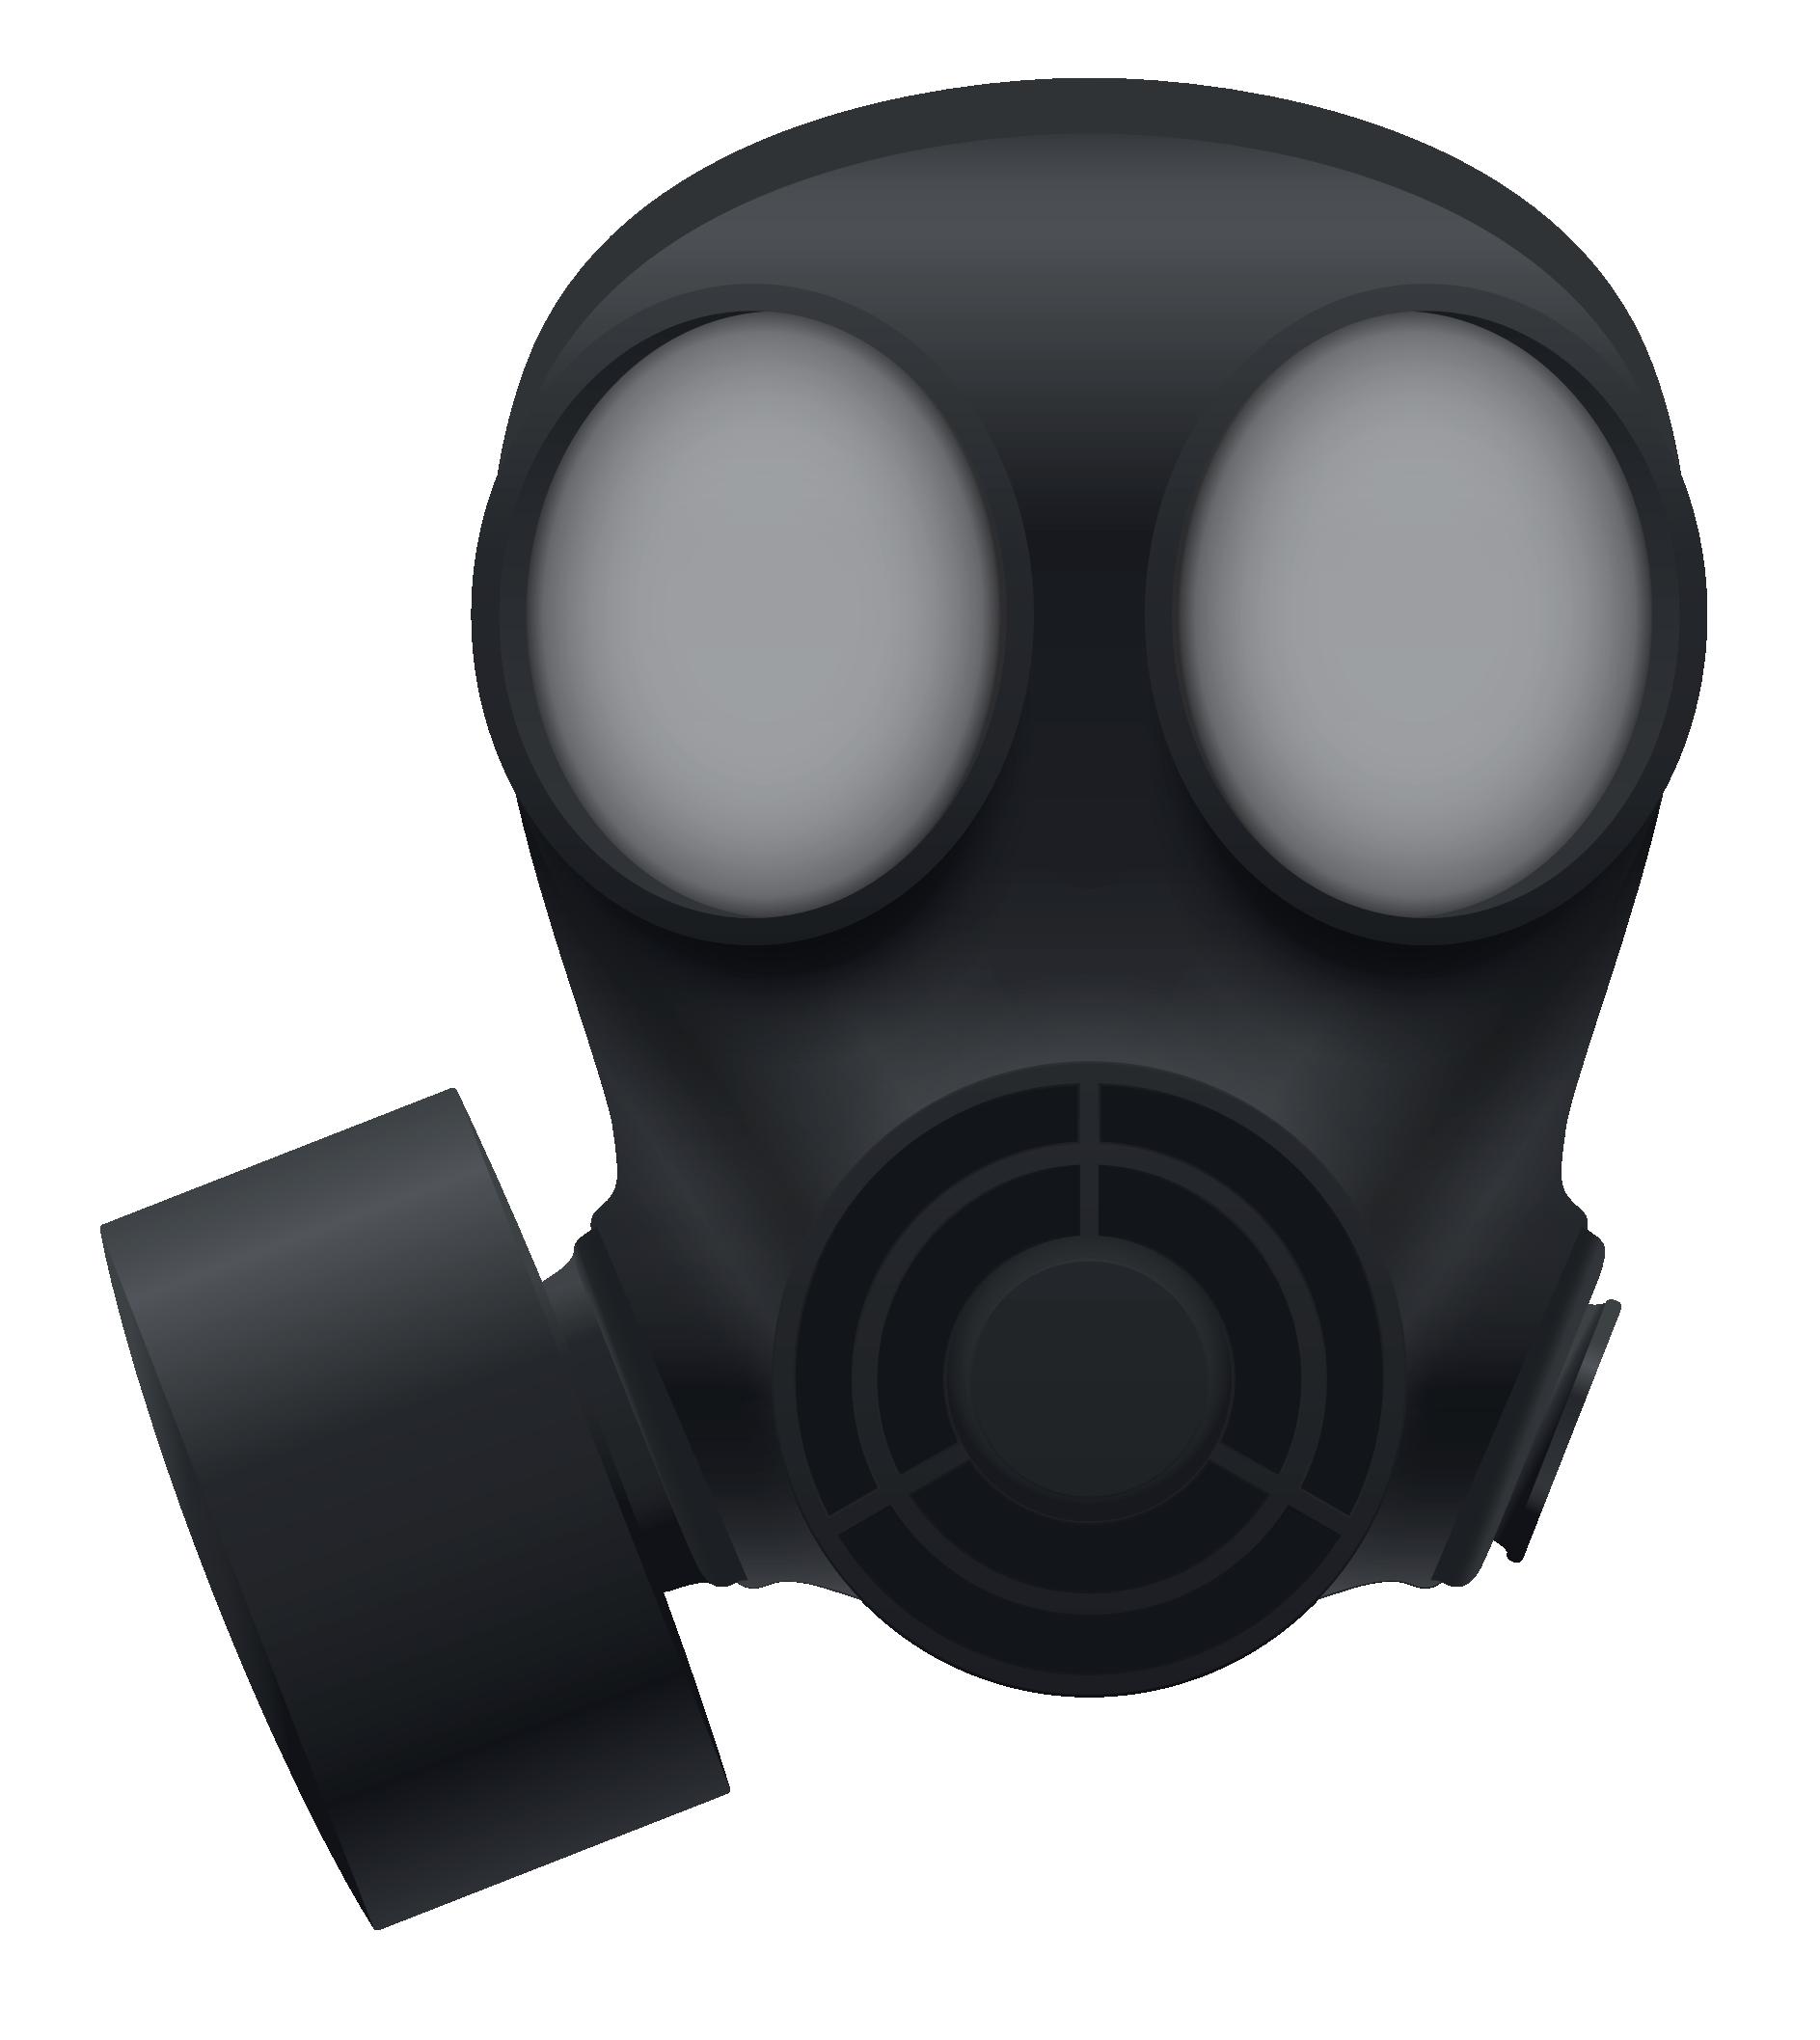 Download Gas Mask Free Download HQ PNG Image | FreePNGImg